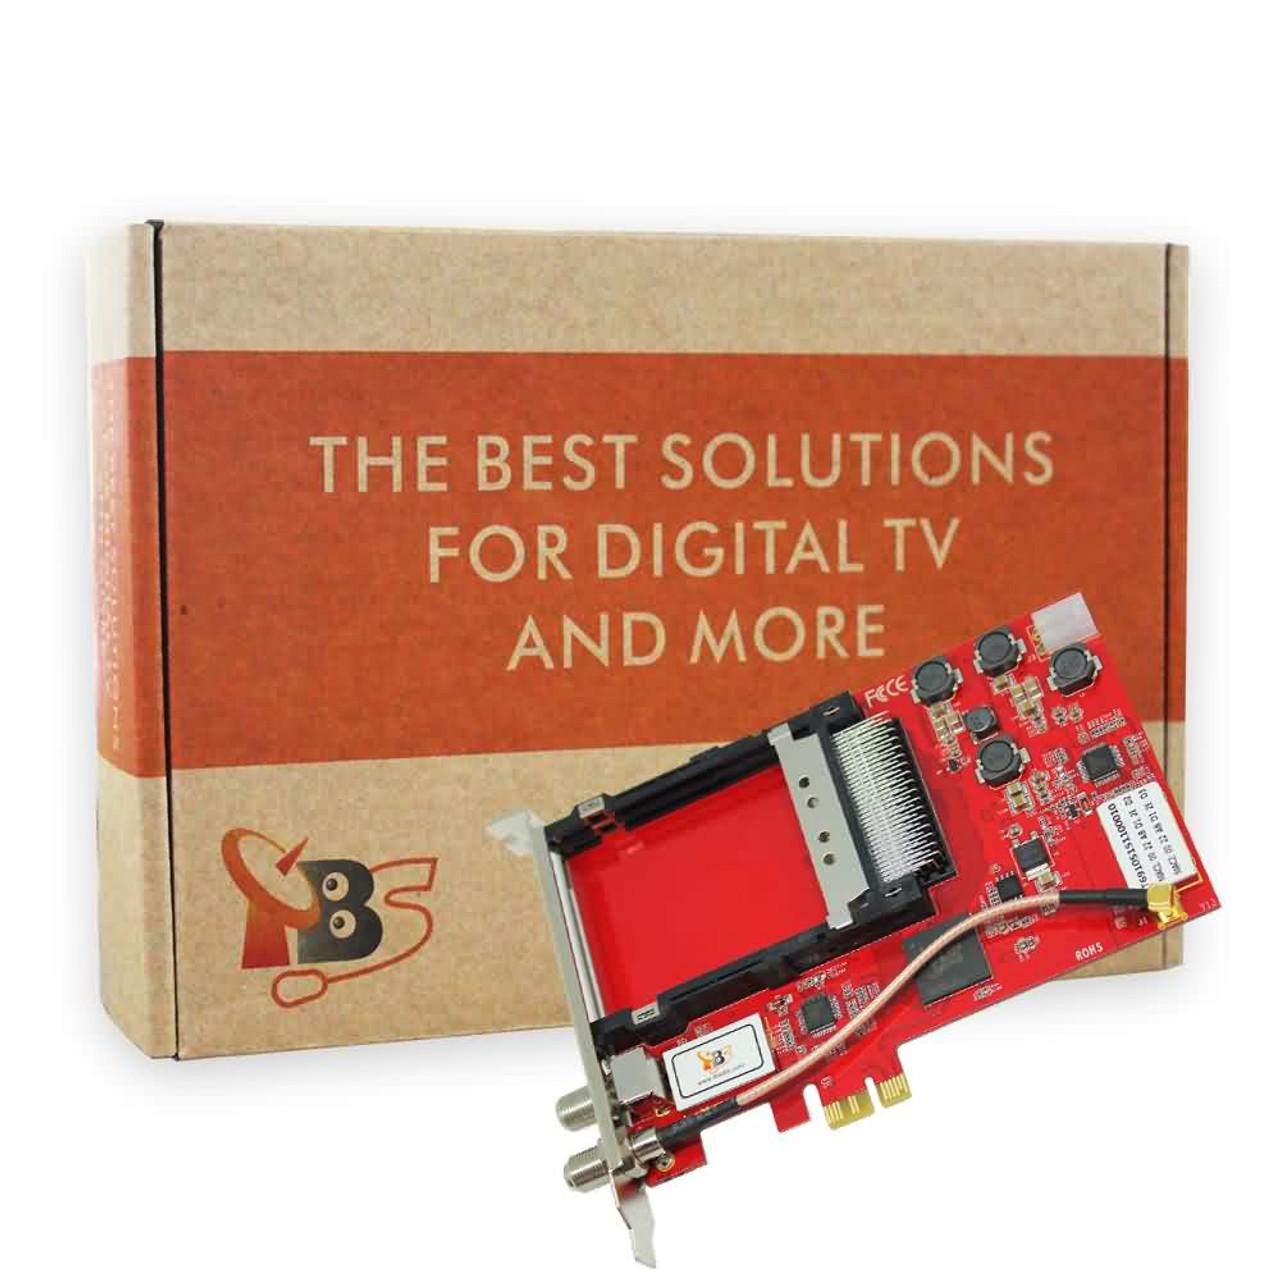 TBS6910 DVB-S2 Dual Tuner Dual CI PCIe Card